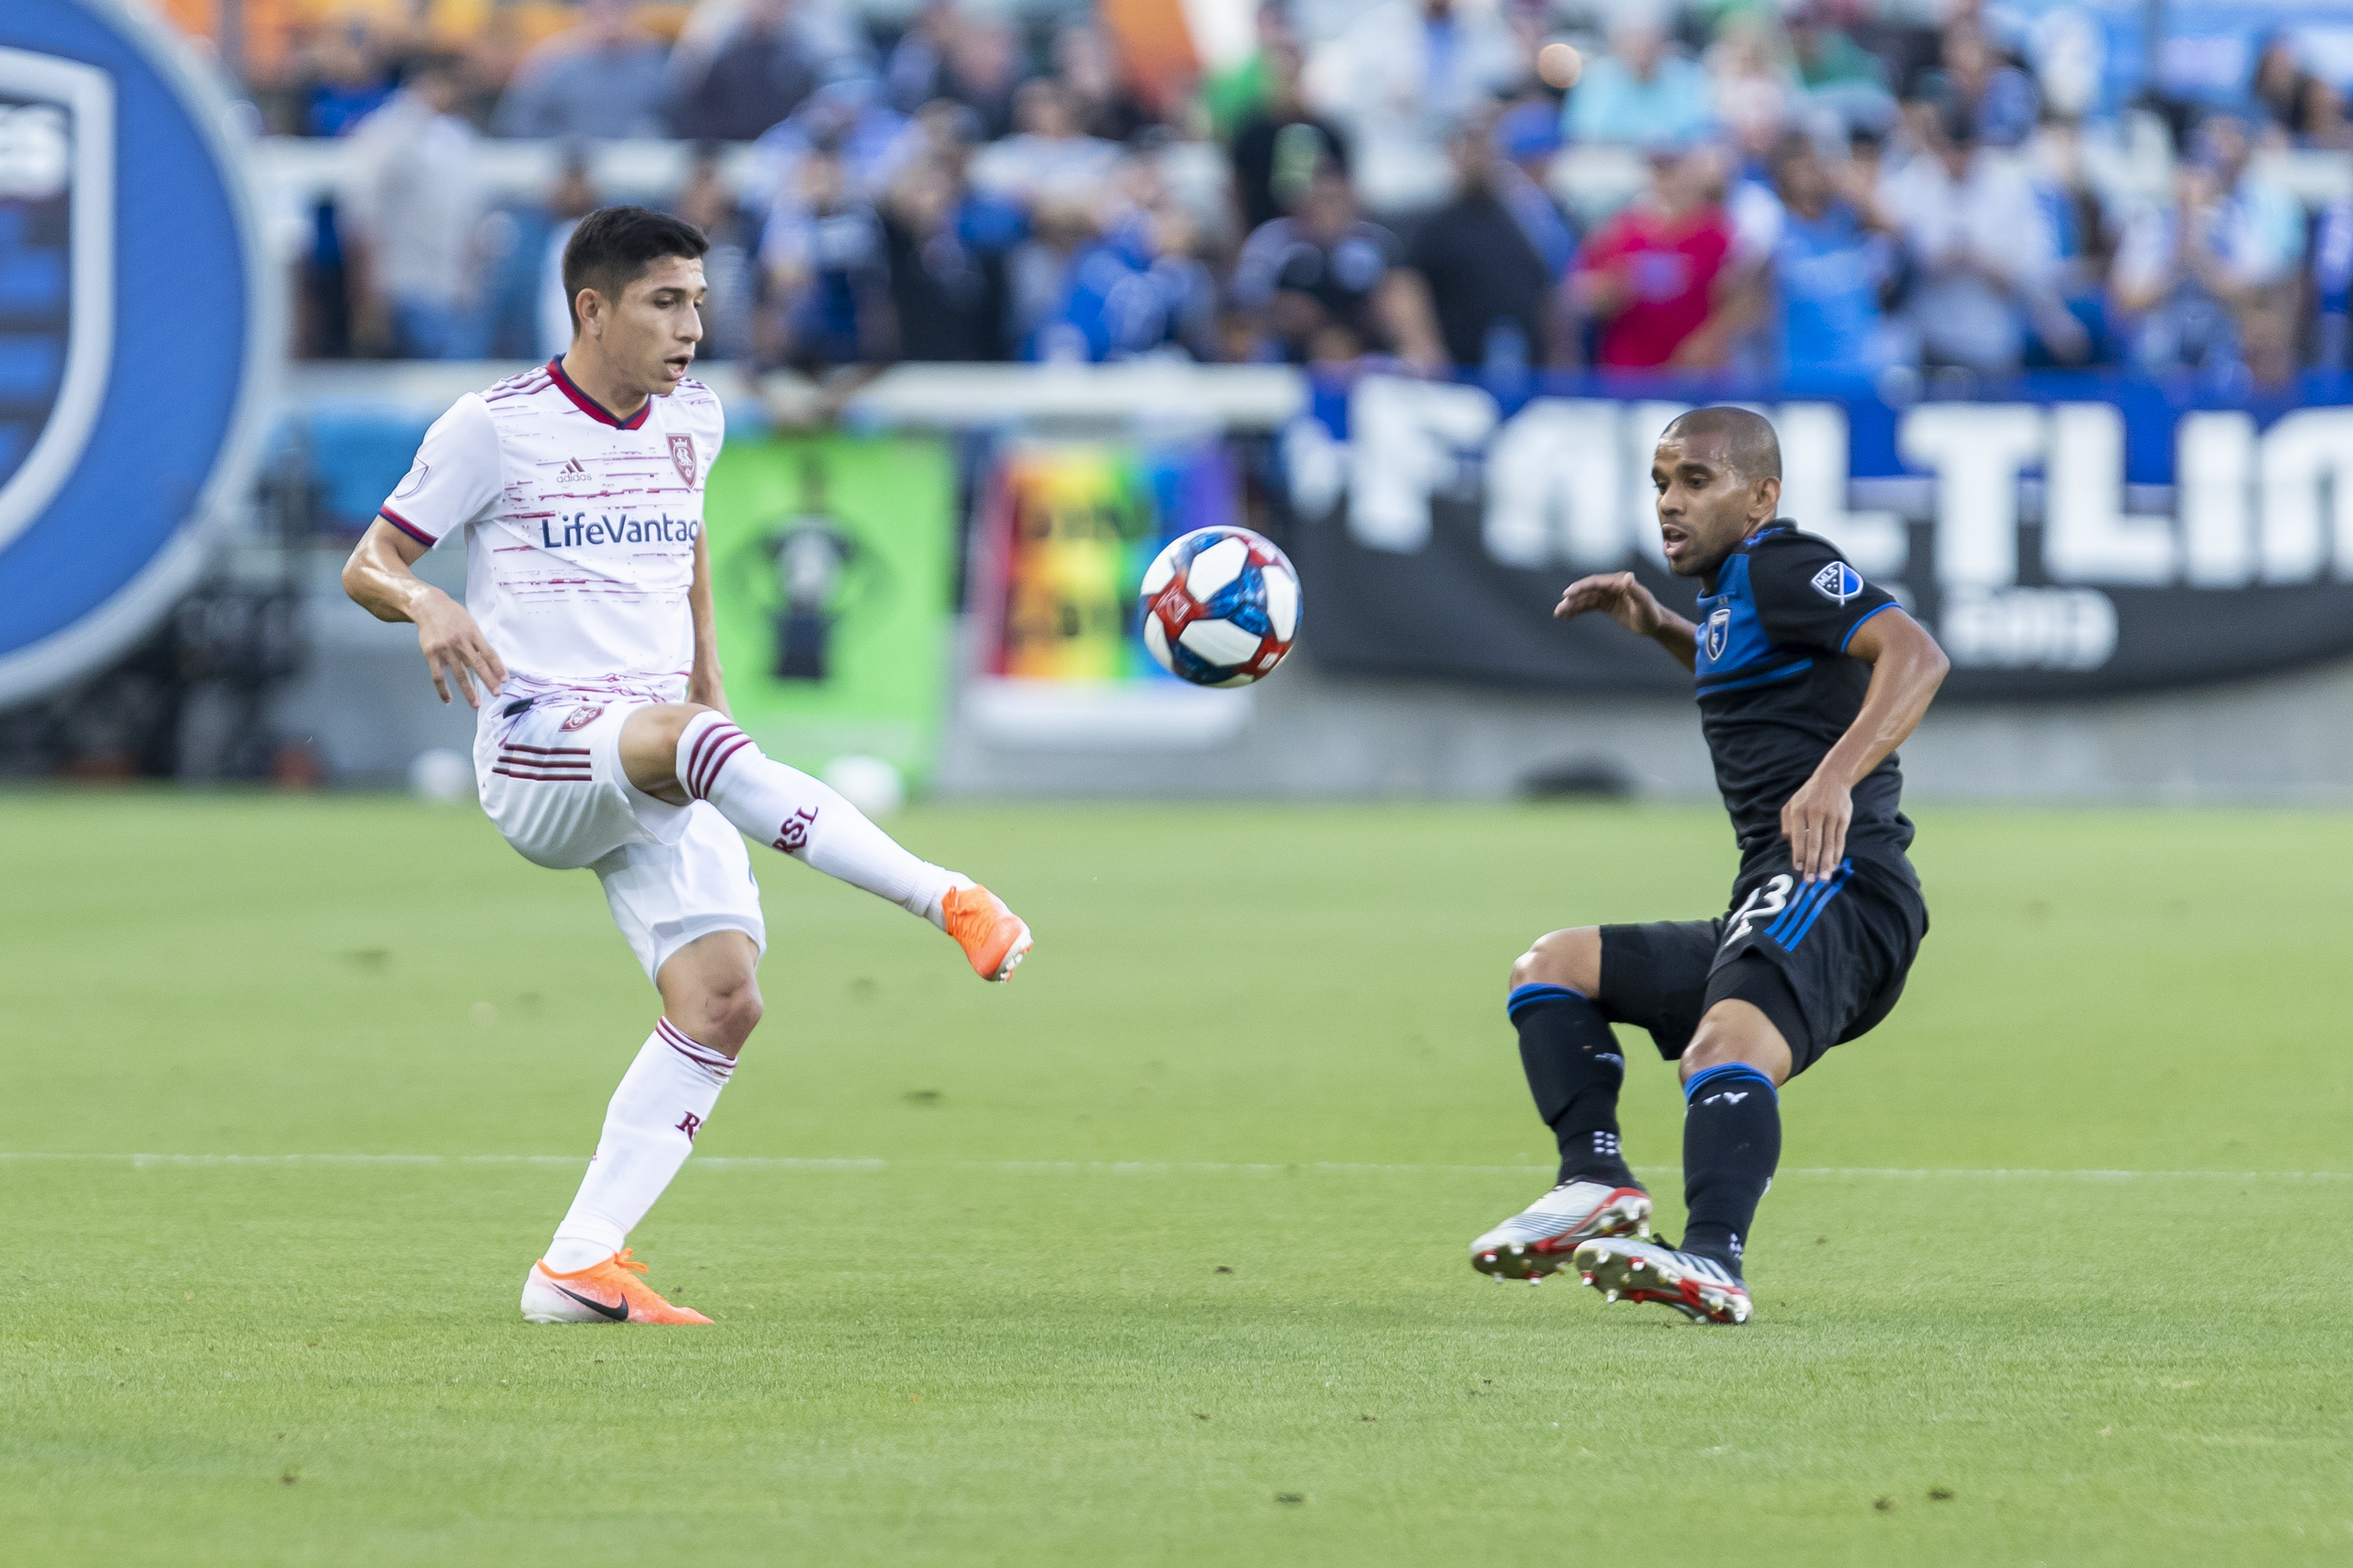 SOCCER: JUL 06 MLS - Real Salt Lake at San Jose Earthquakes